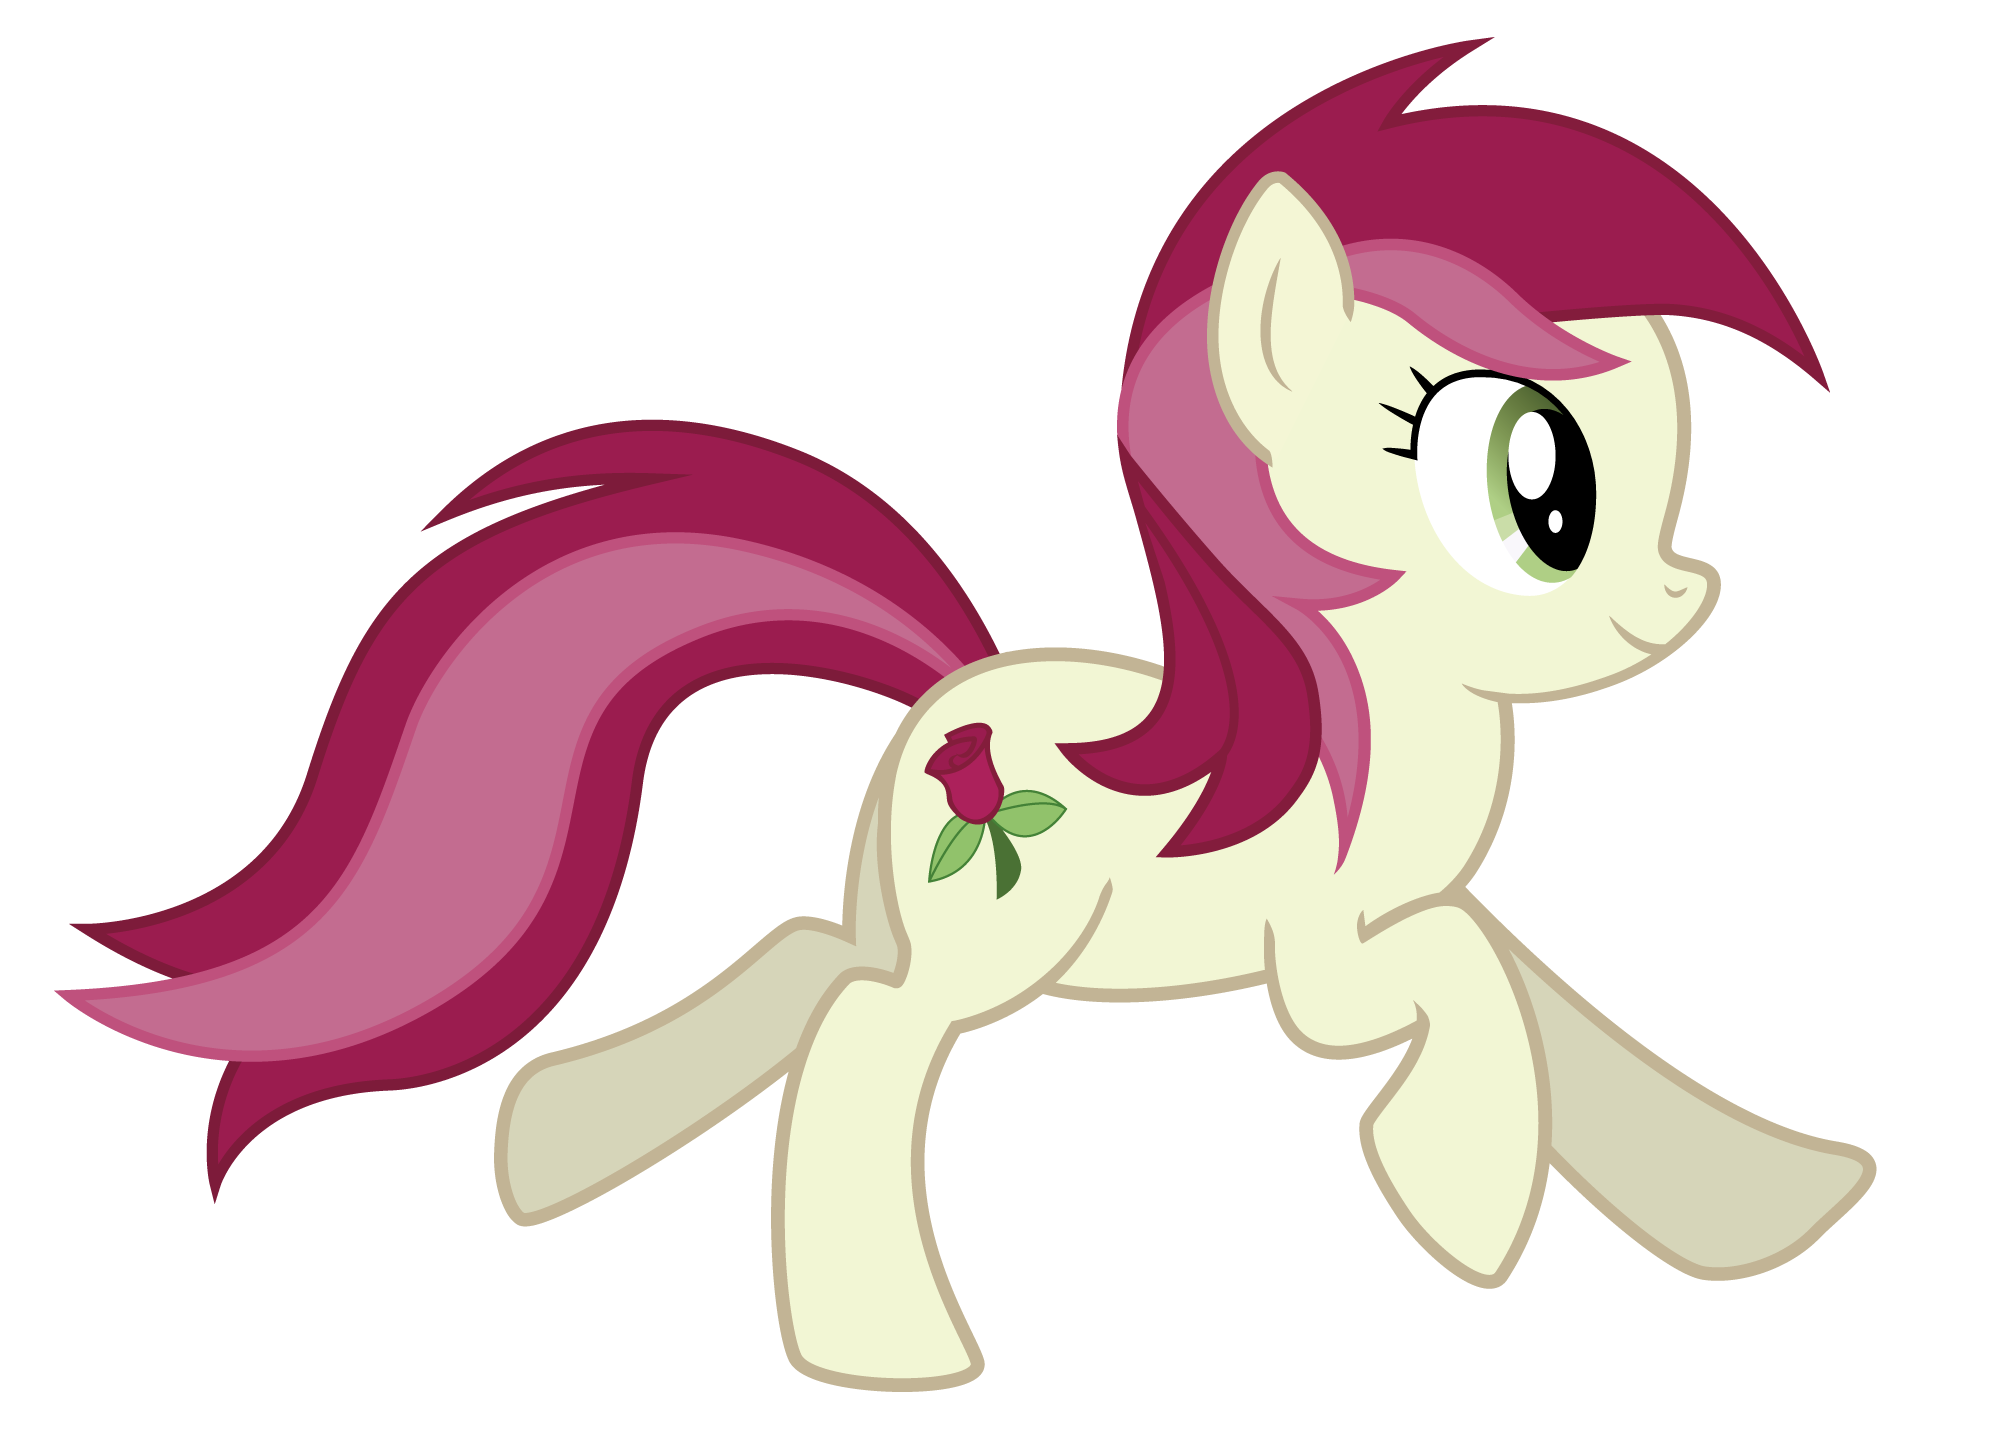 Rose | My Little Pony Friendship is Magic Wiki | Fandom powered by ...